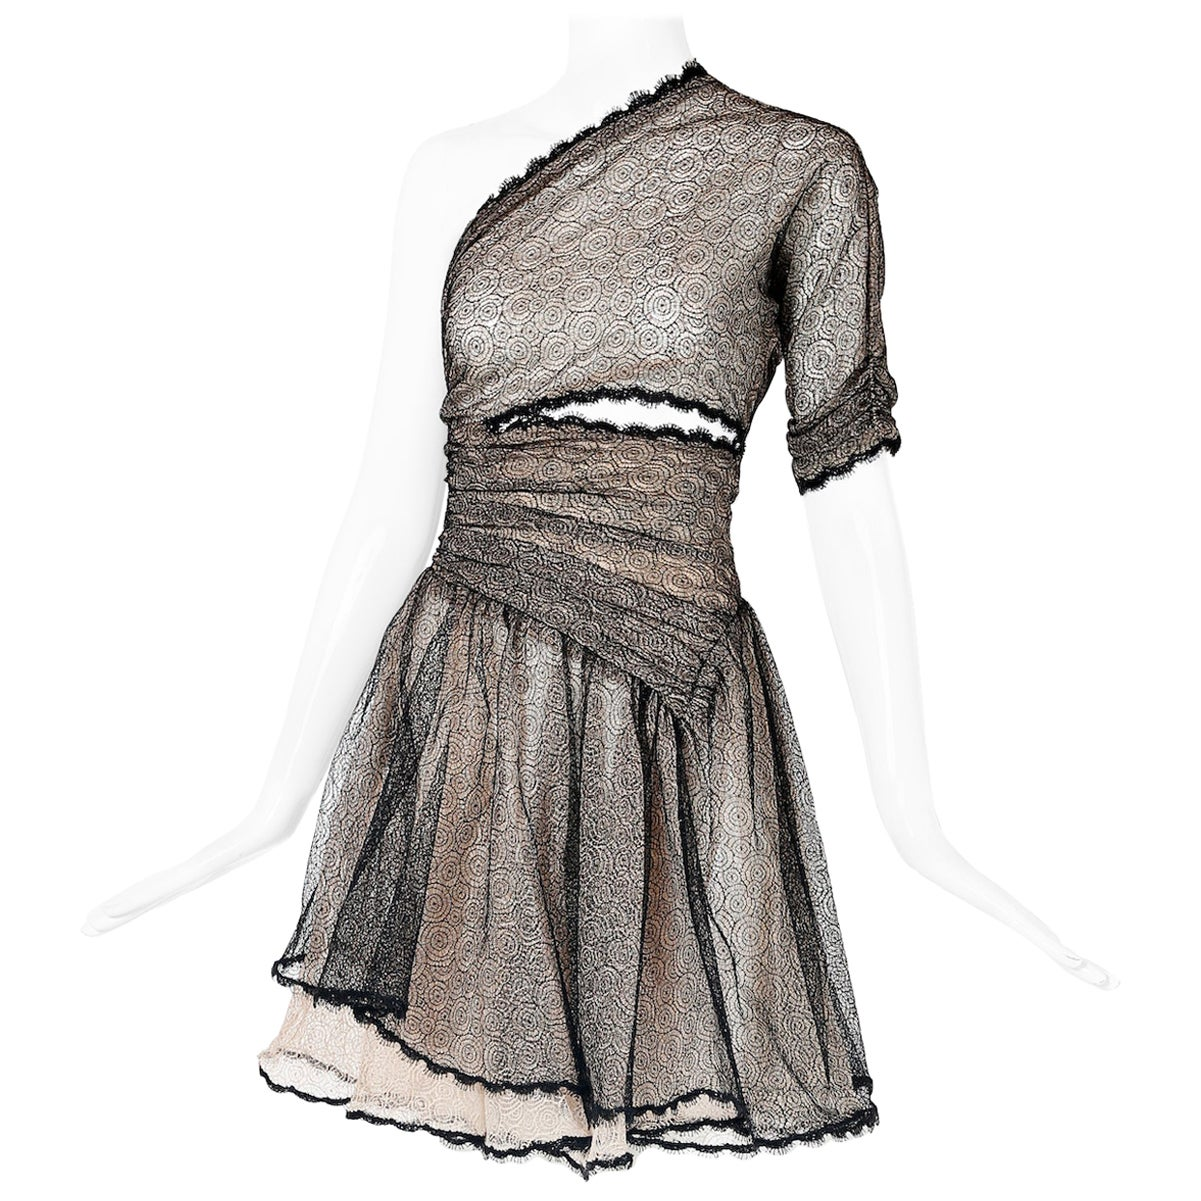 Vintage Geoffery Beene Single Shoulder Lace Mini-Dress w/Cutout Detail at Waist